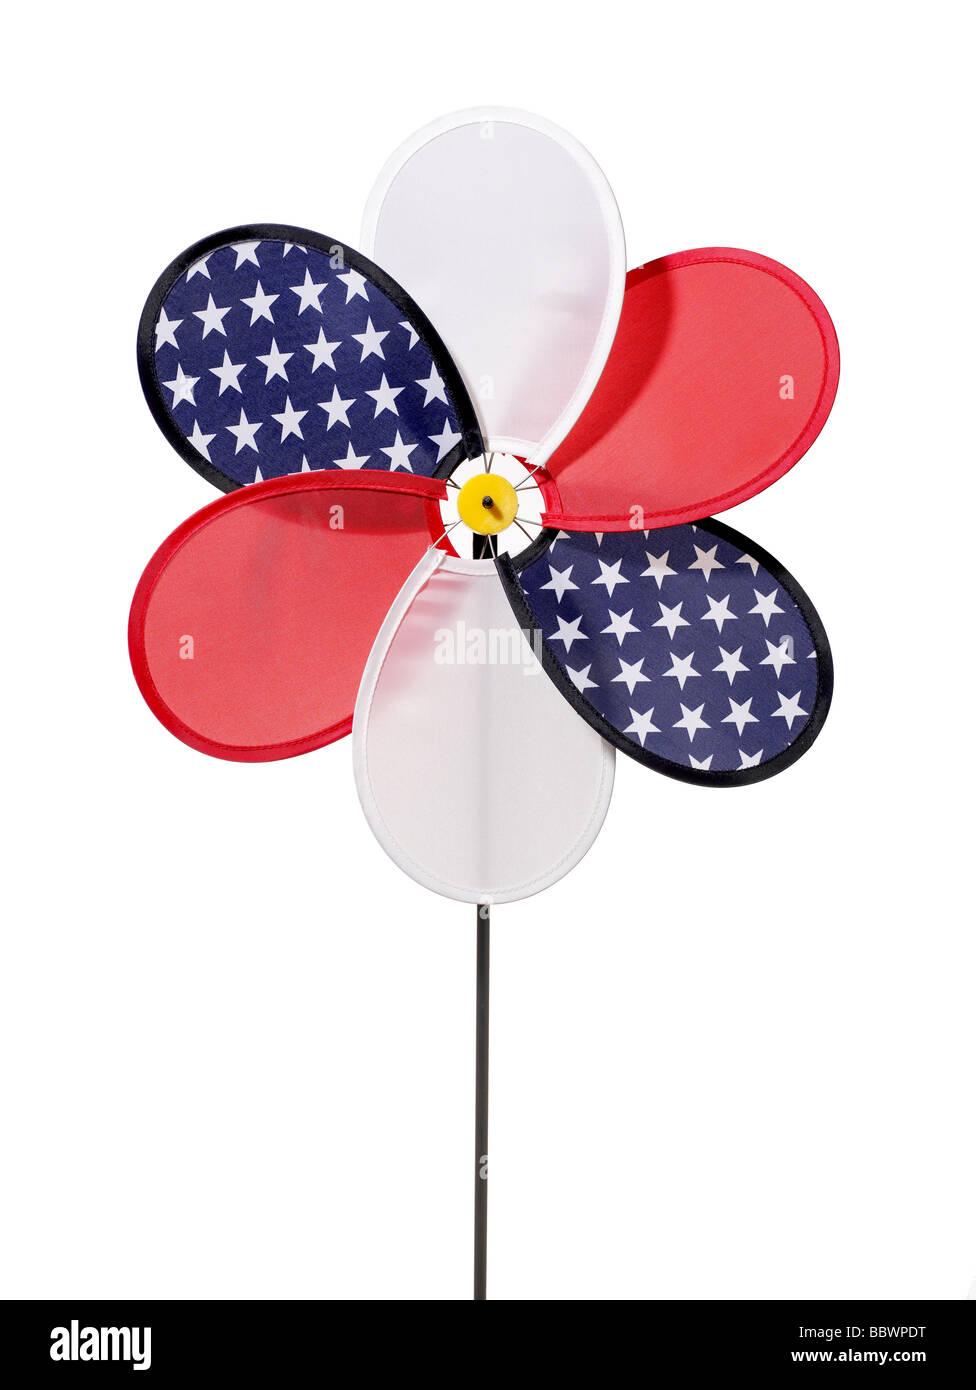 Red white blue Pin wheel patriot patriotic flag - Stock Image